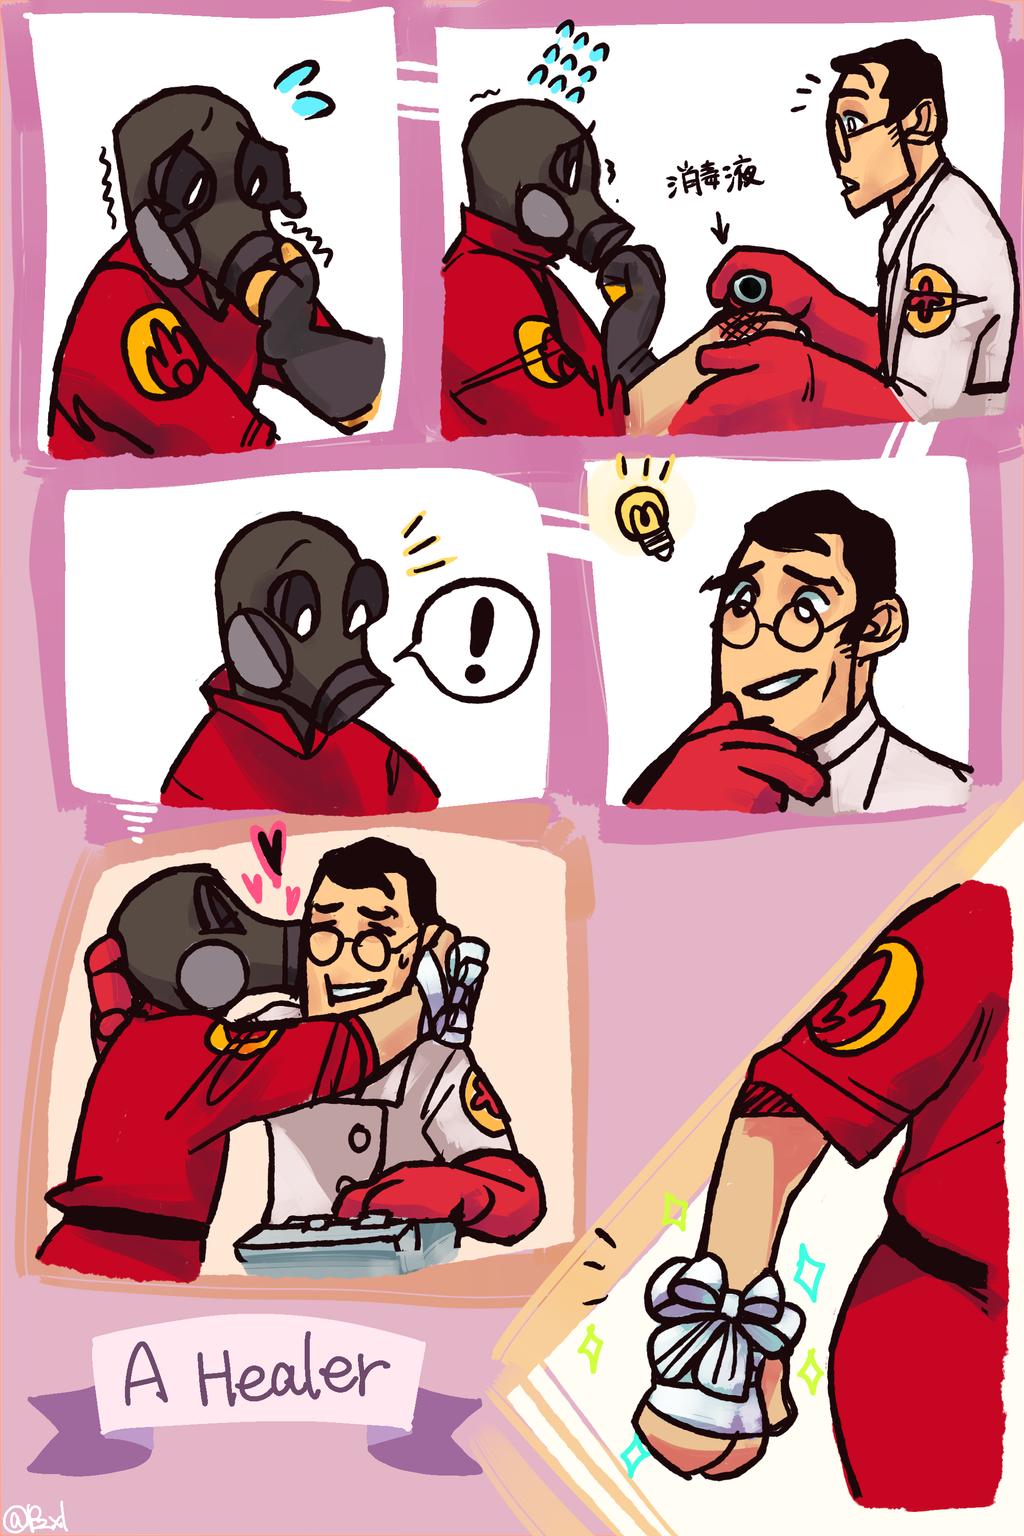 A Healer by Tinypop